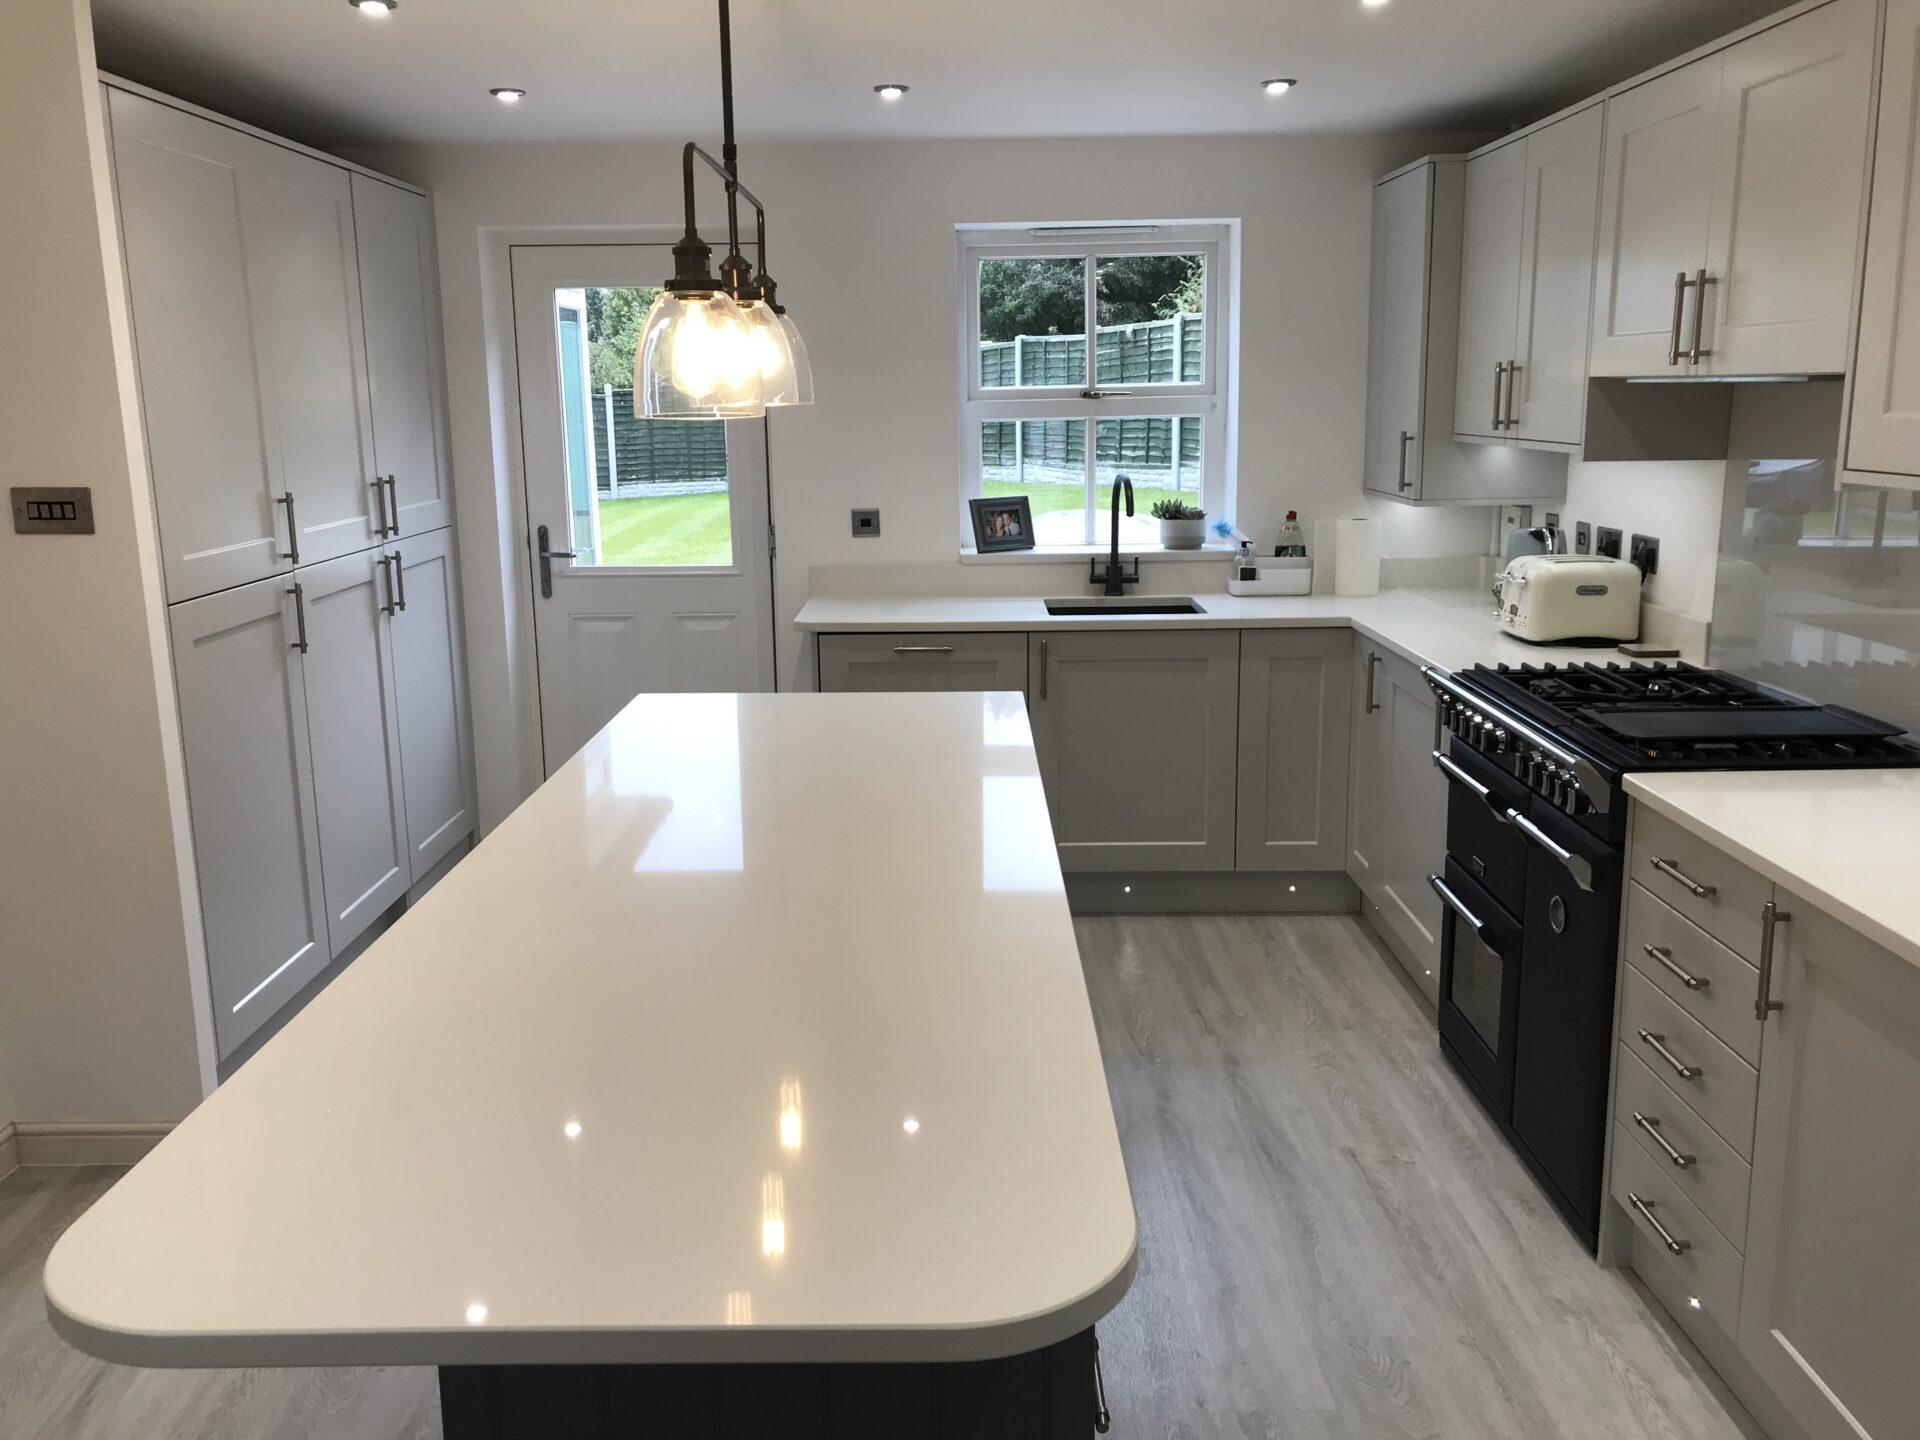 Charnwood Paint Laquered Light Grey & Dust Grey with Quartz Surfaces - Admaston